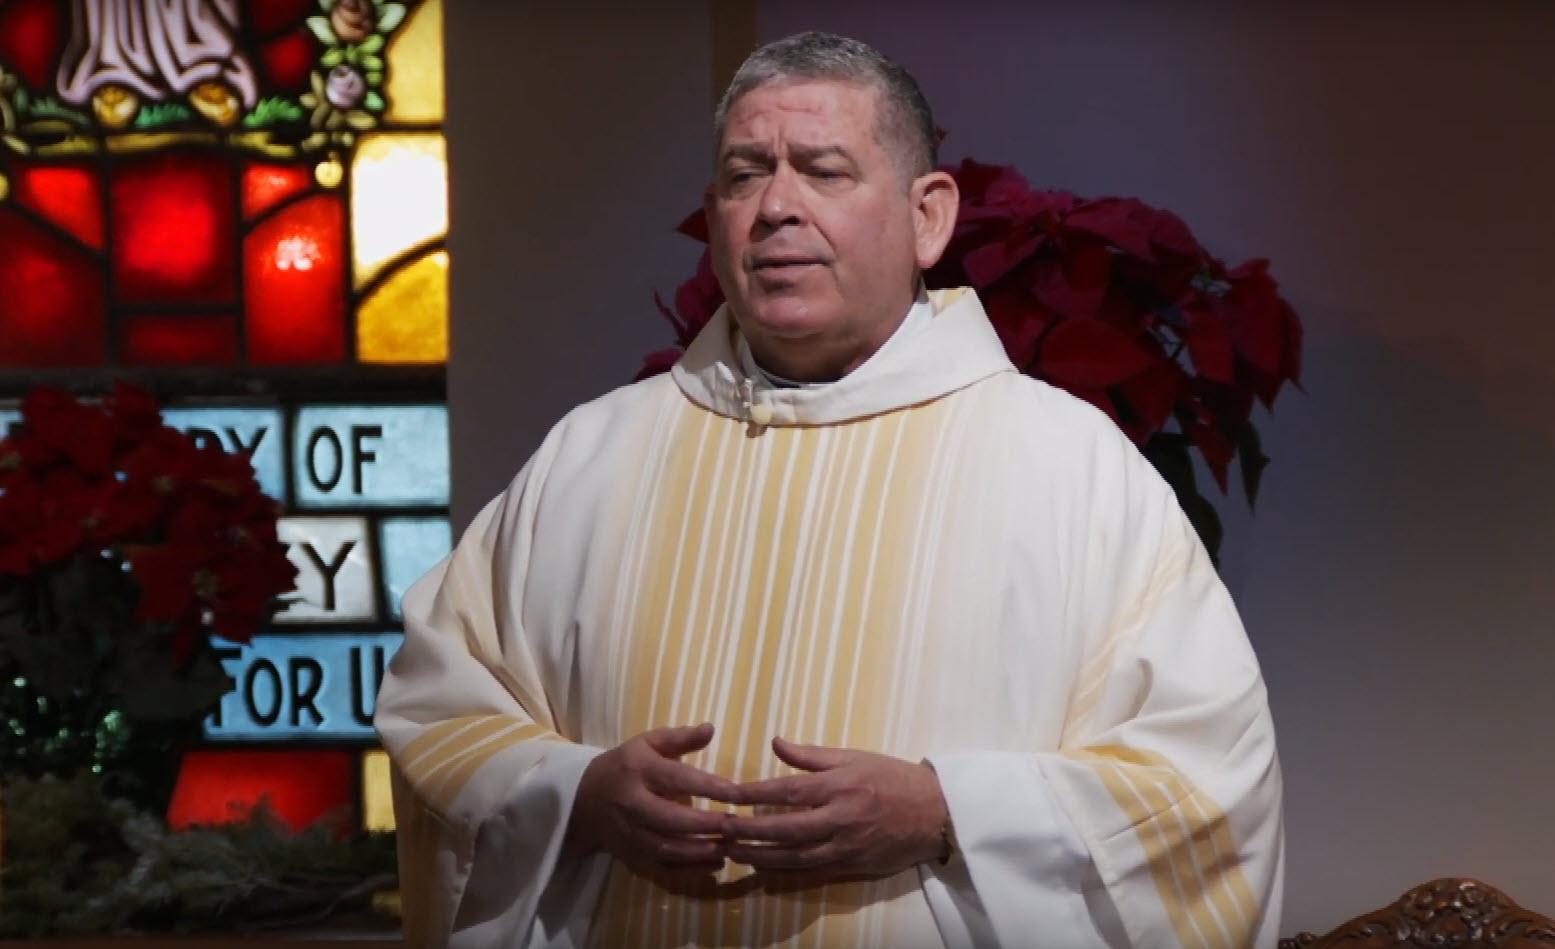 Fr. Scott Donahue leading Christmas Mass